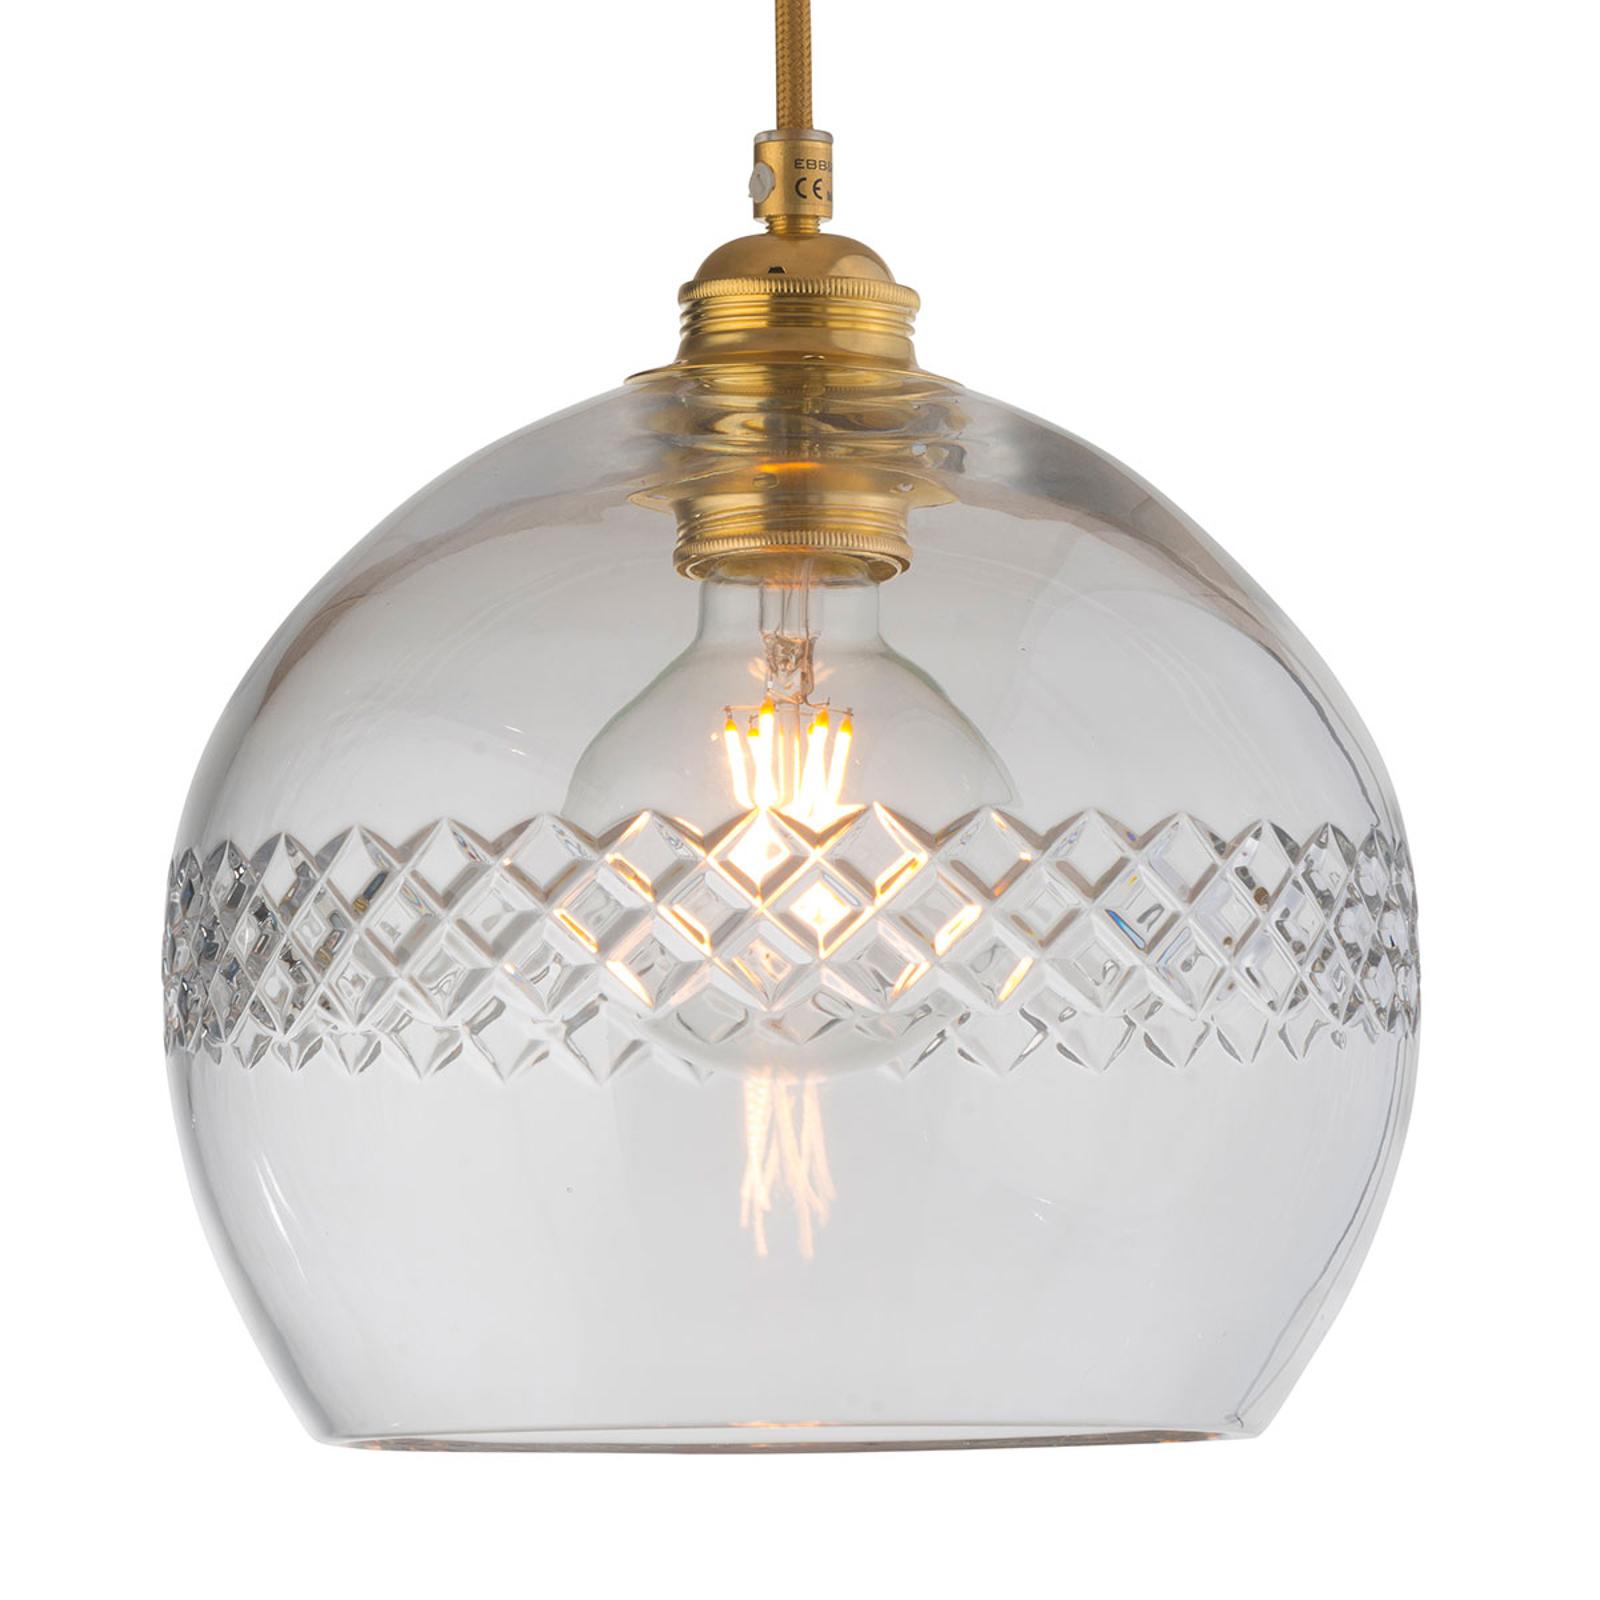 EBB & FLOW Rowan lampa wisząca, karo Ø 22cm